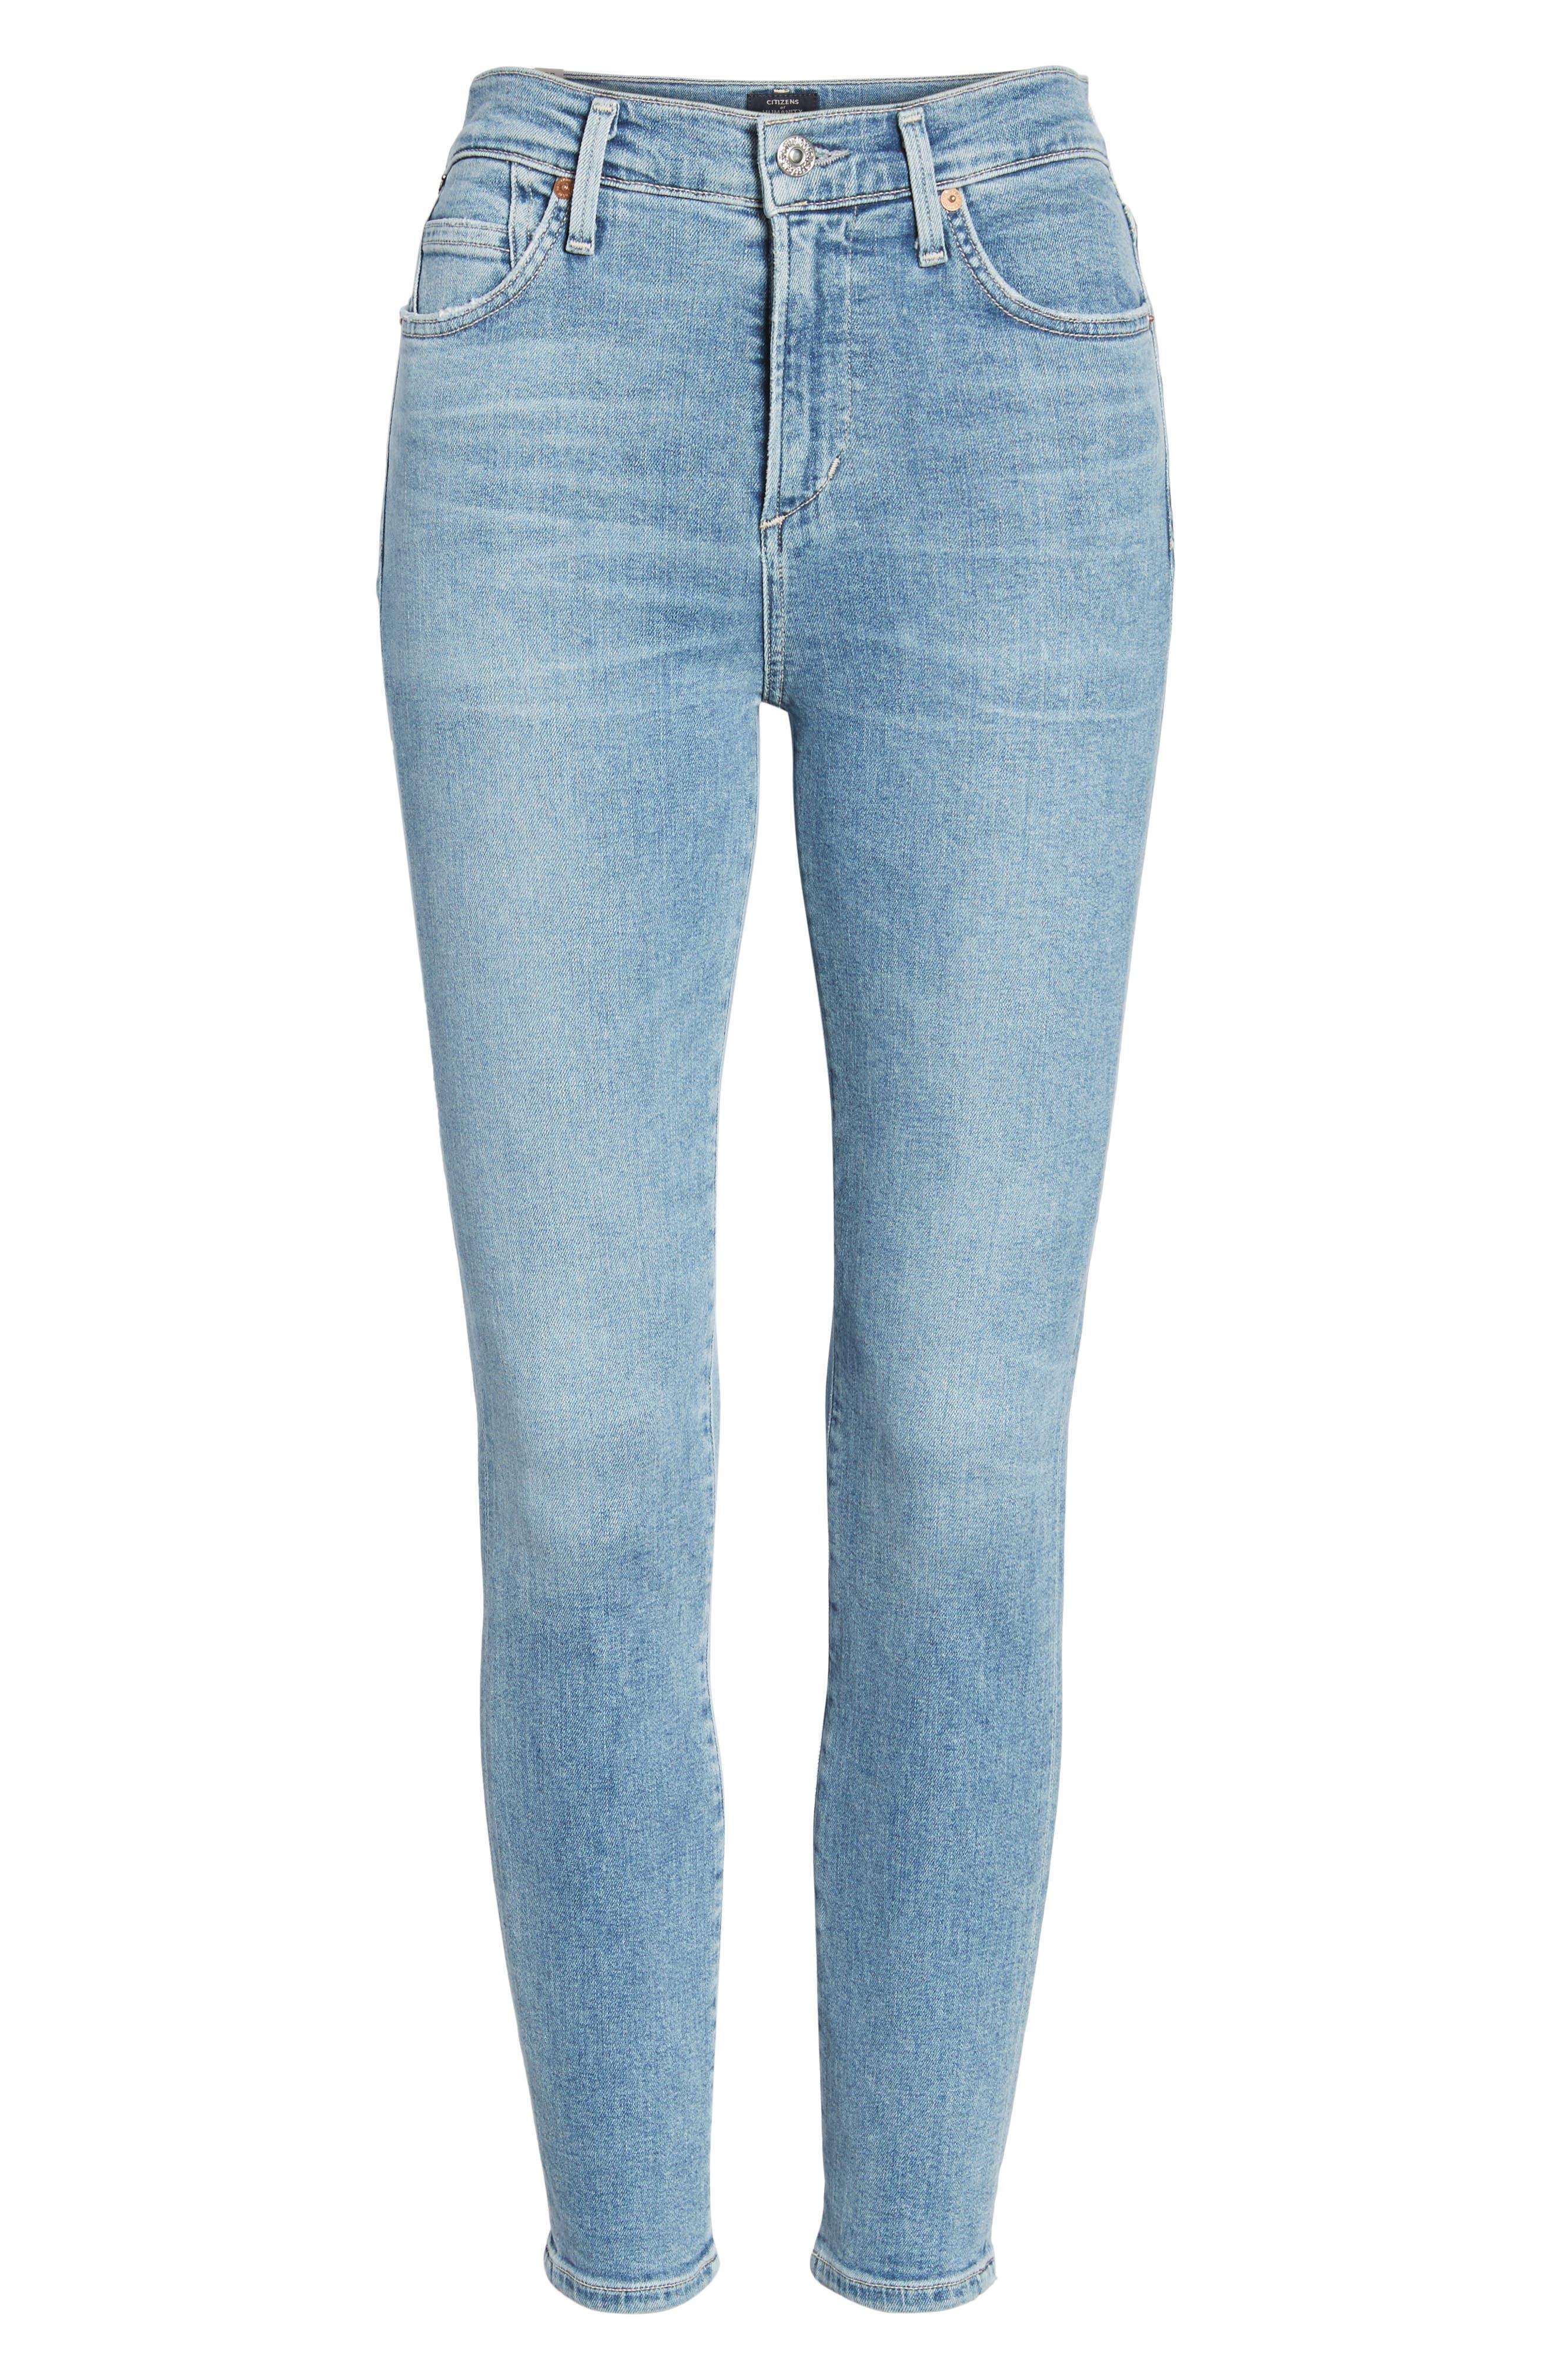 Rocket High Waist Crop Skinny Jeans,                             Alternate thumbnail 7, color,                             457